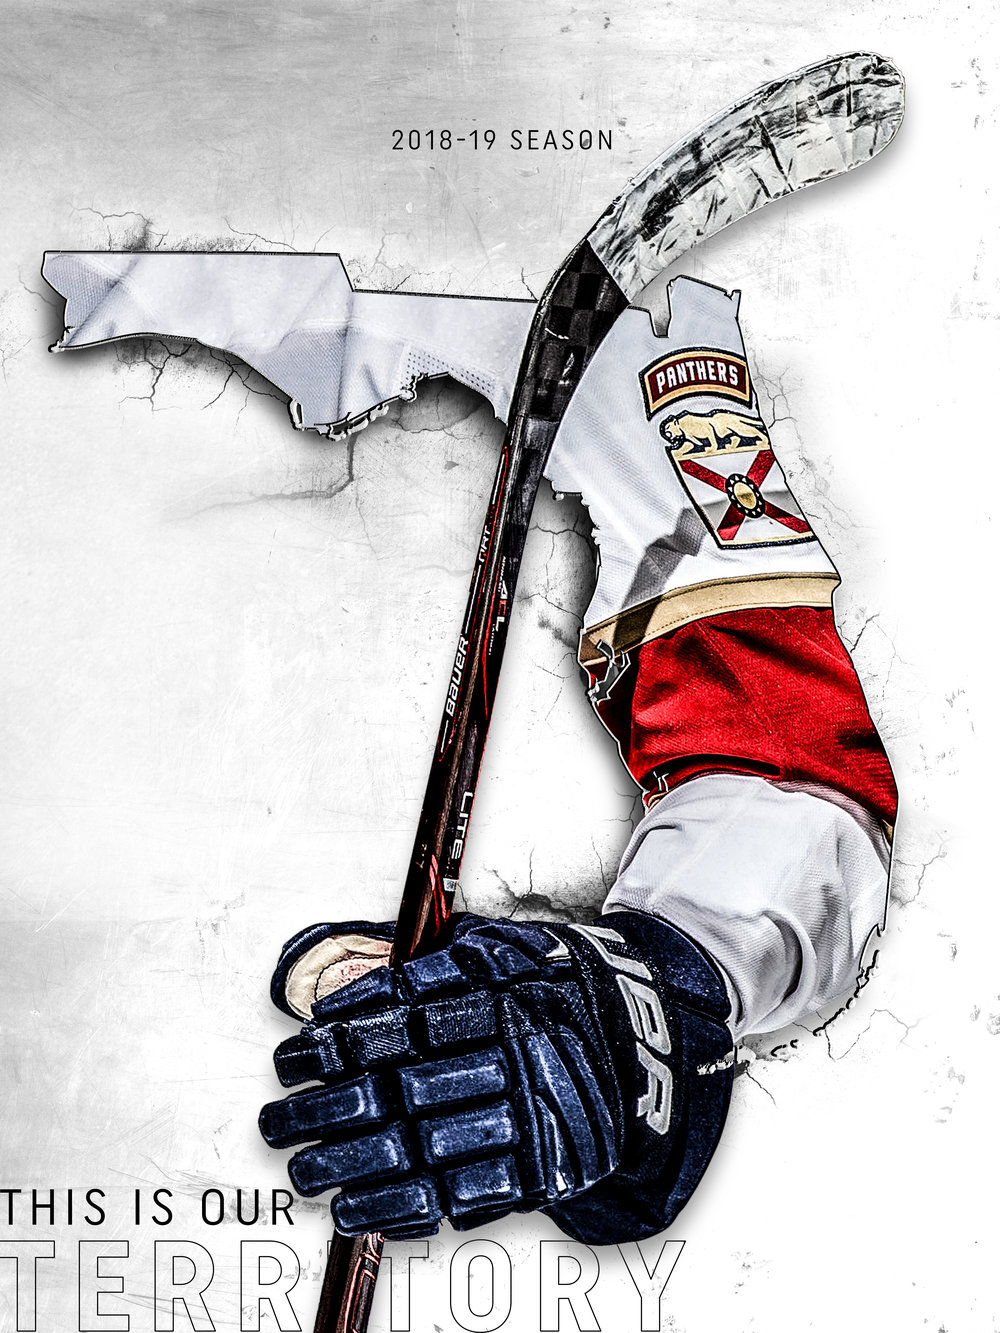 Florida_Panthers_White_Silver_Look_New_Season_Branding_03 copy.jpg